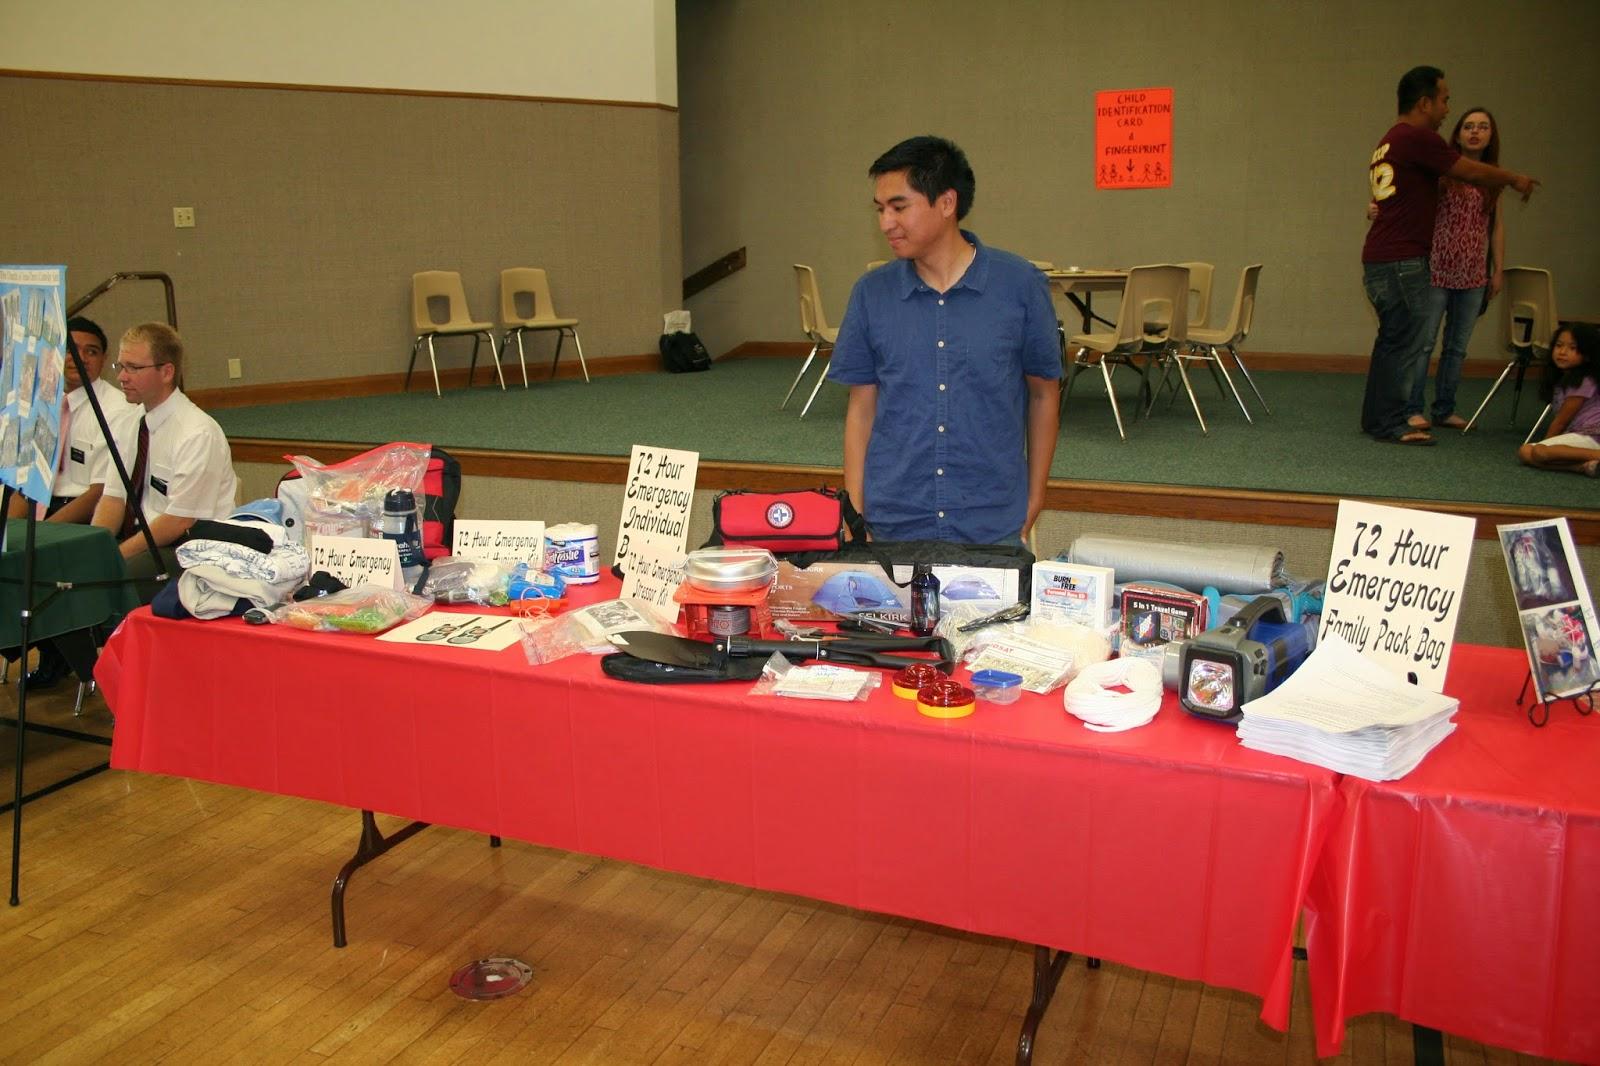 The Ark Carson Ward Food Storage Emergency Preparedness